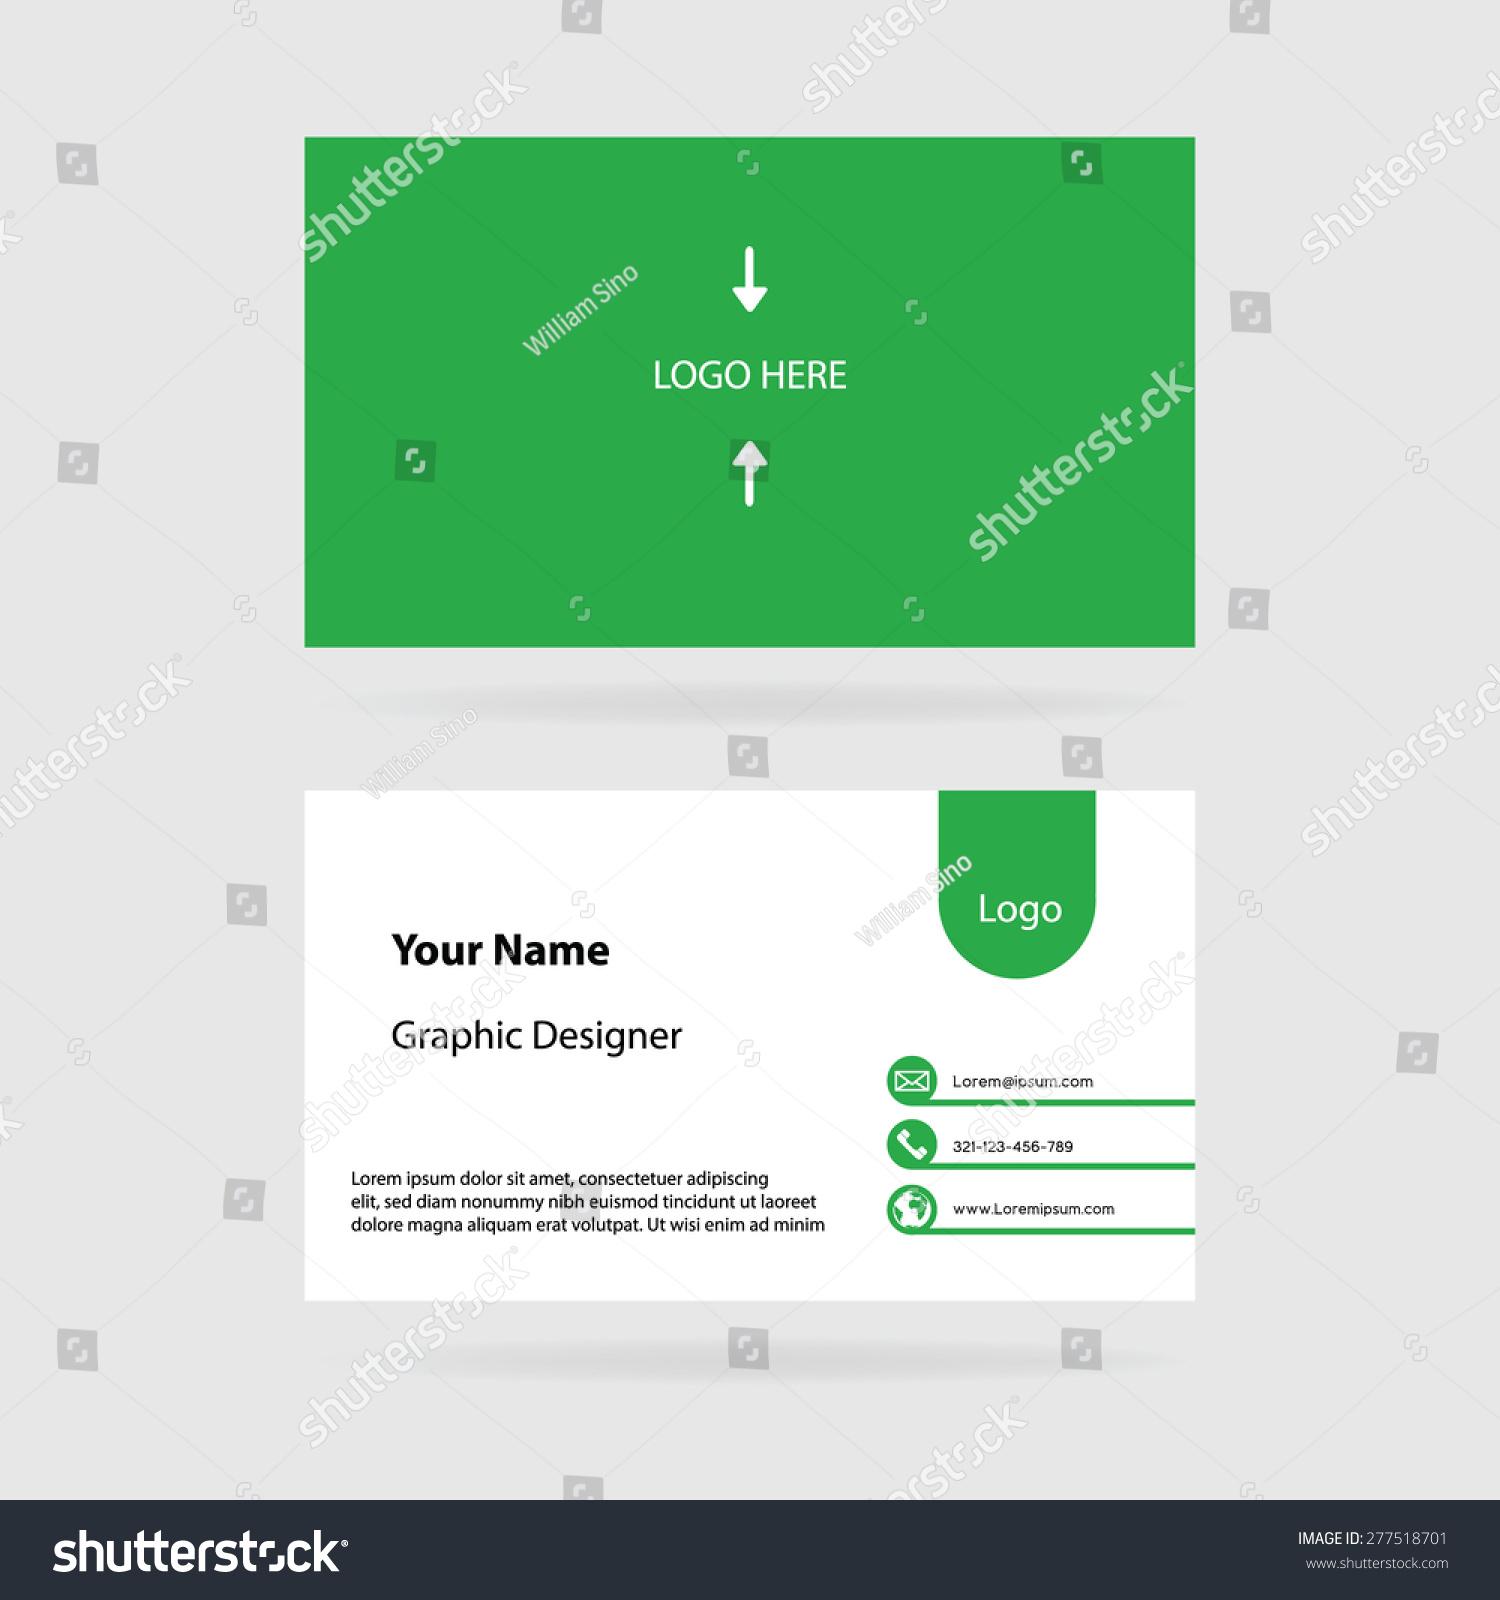 Simple Modern Green Business Card Template Stock Vector 277518701 ...